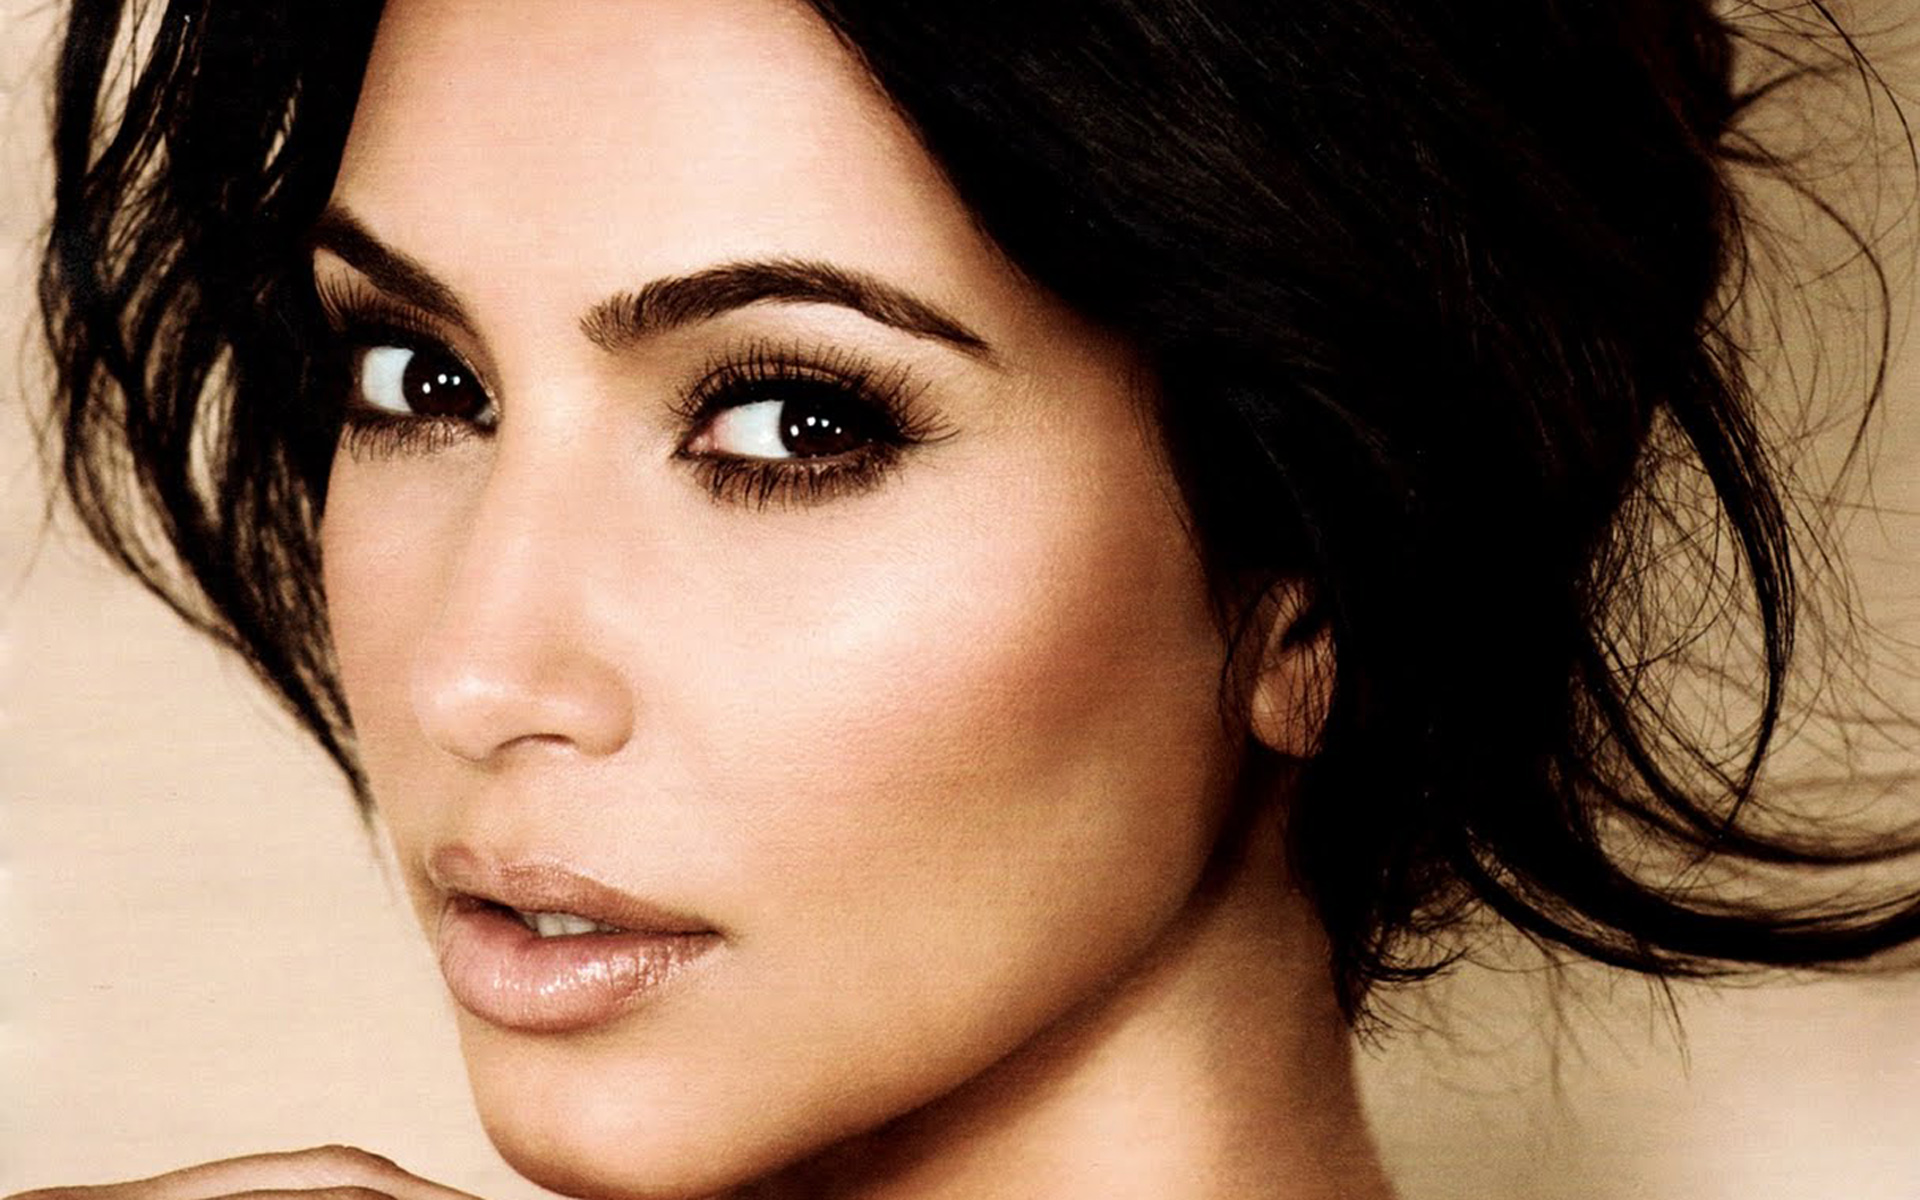 2014 Kim Kardashian   Wallpaper High Definition High Quality 1920x1200